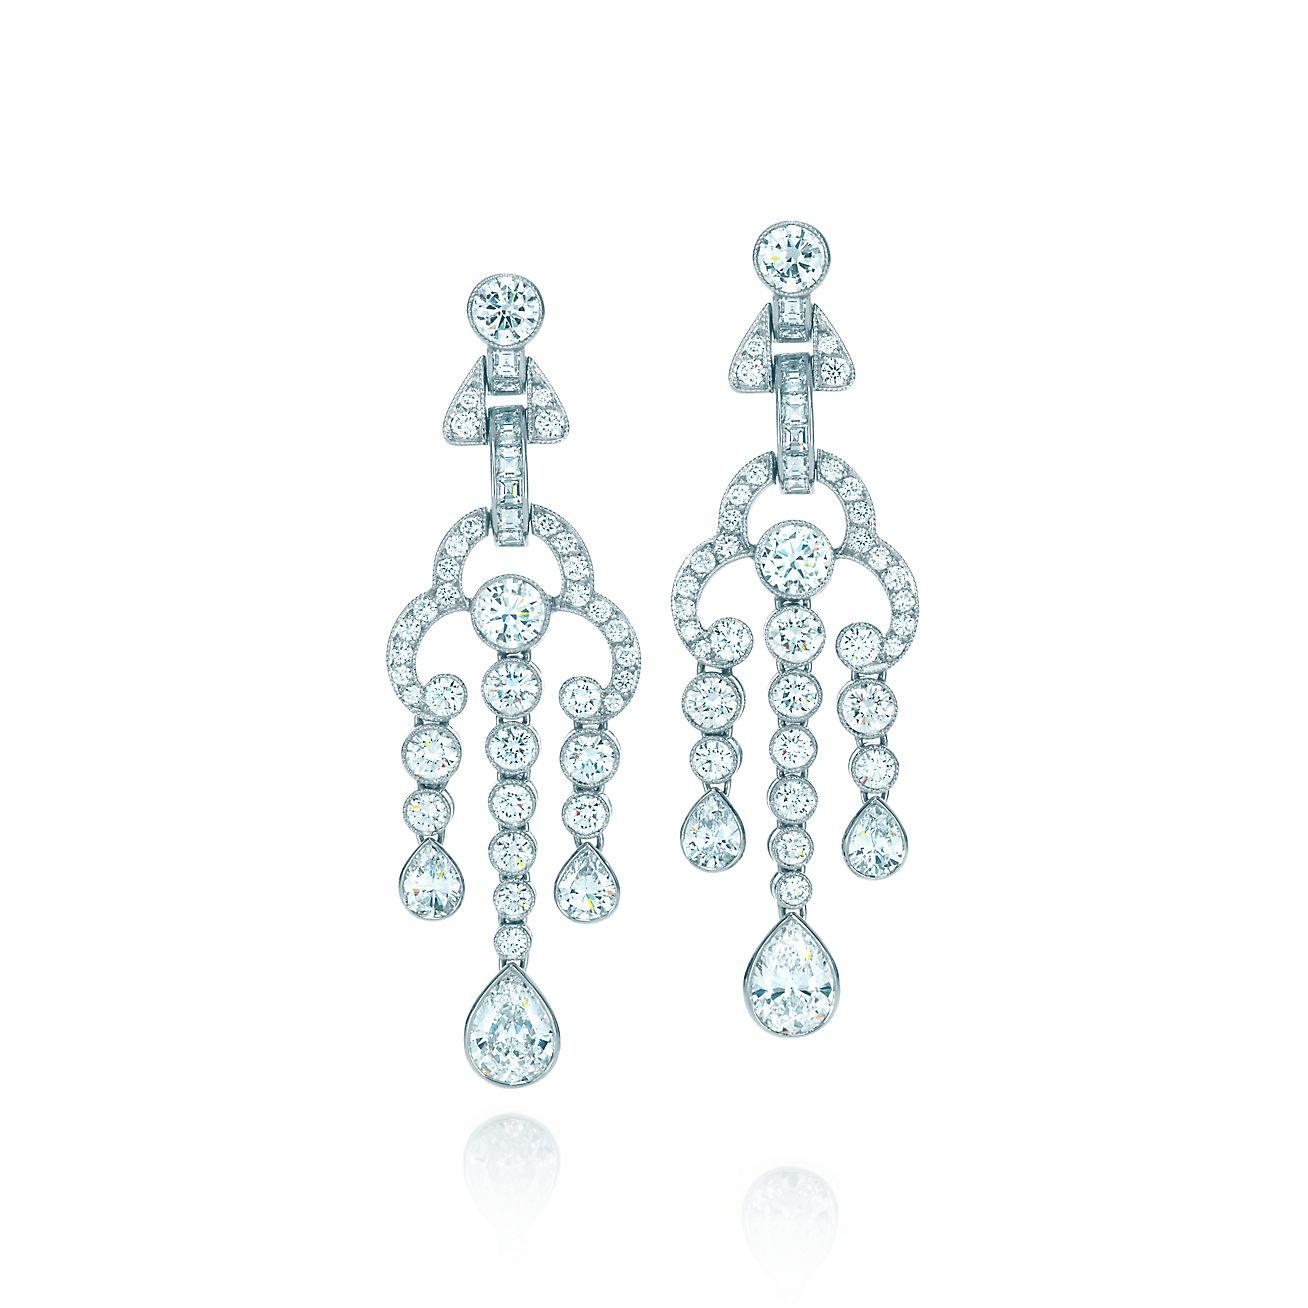 940d97687 ... tiffany jazz™ triple drop earrings in platinum with diamonds. ...